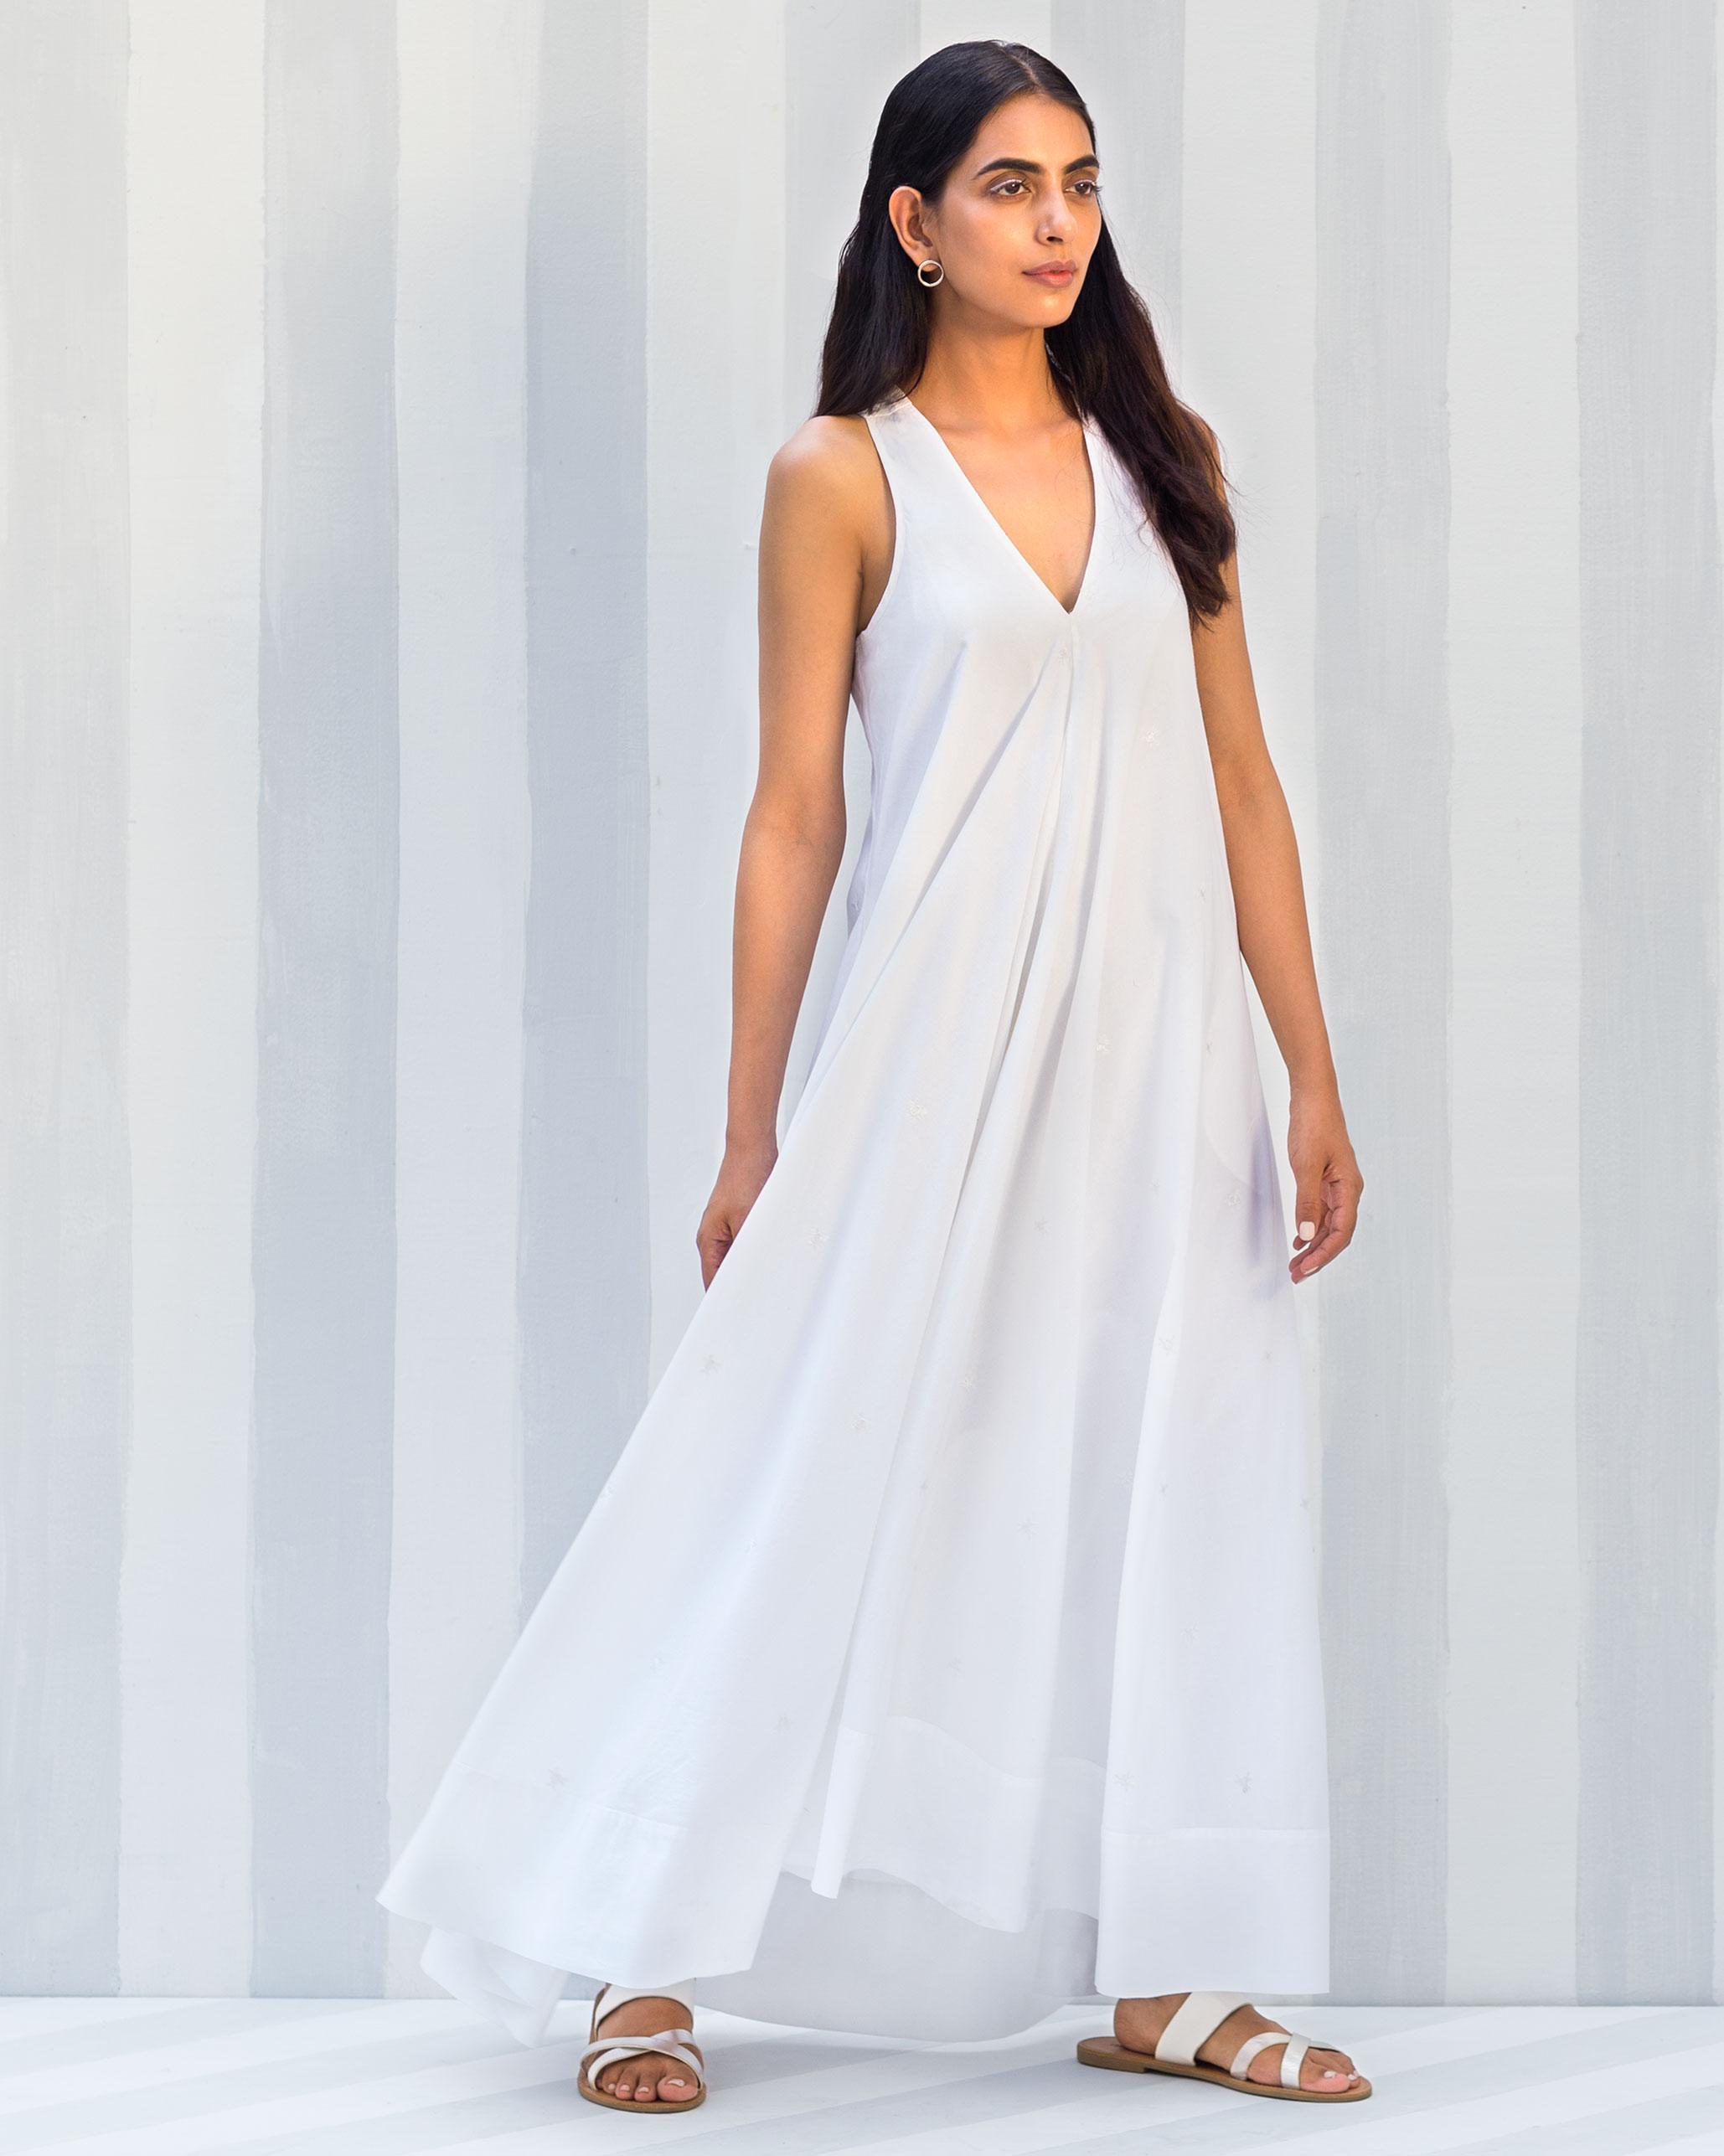 bedd8c76f39 Buy Goa Maxi Dress - White Women Dresses Online